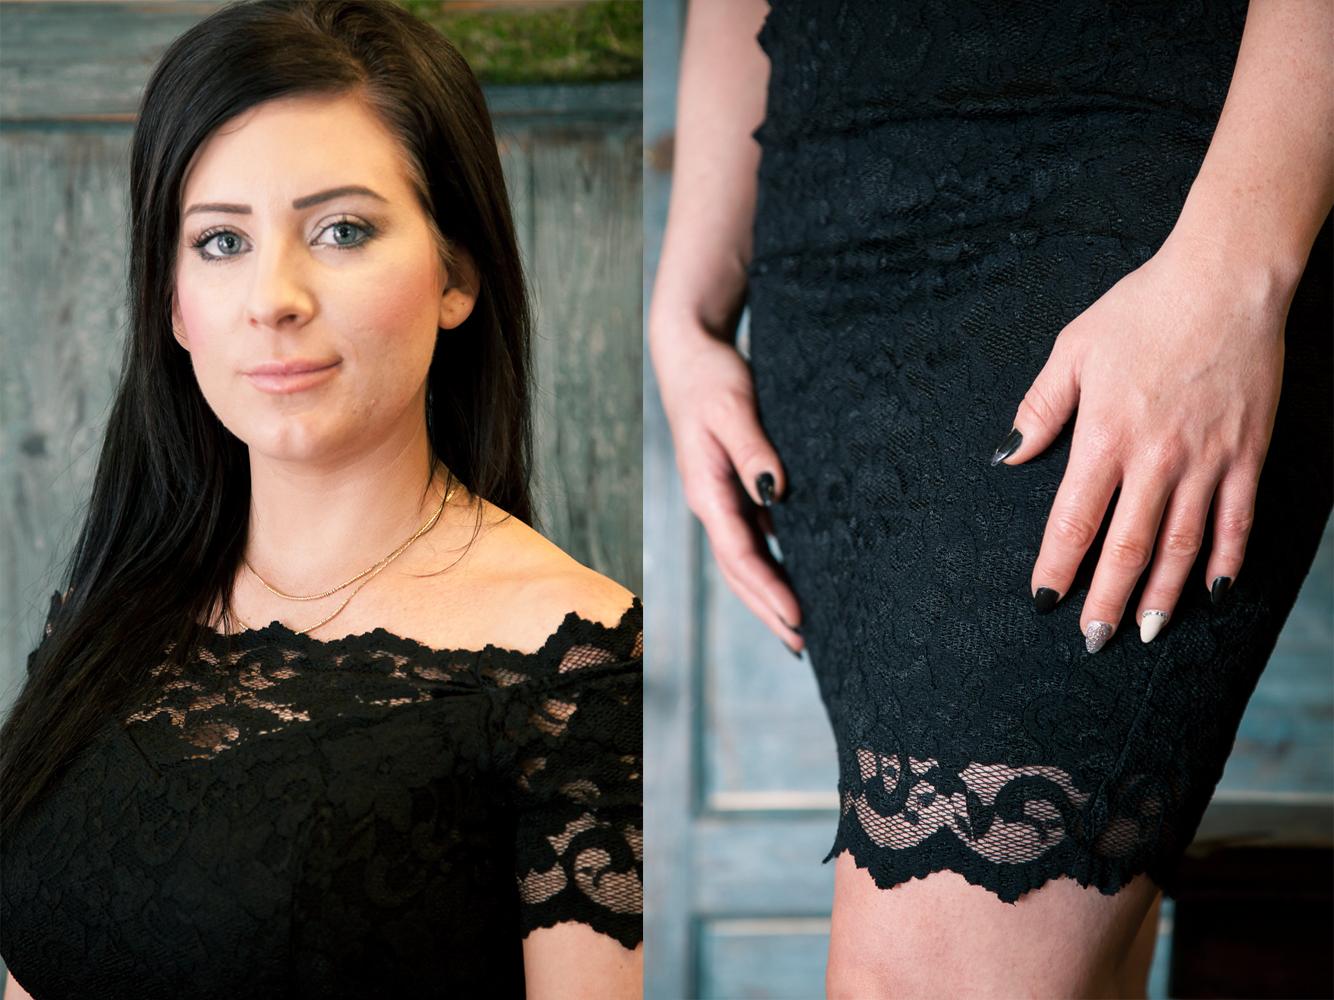 Bella-Maas-edmonton-style-dress-date-debbie-shuchat-lace-black